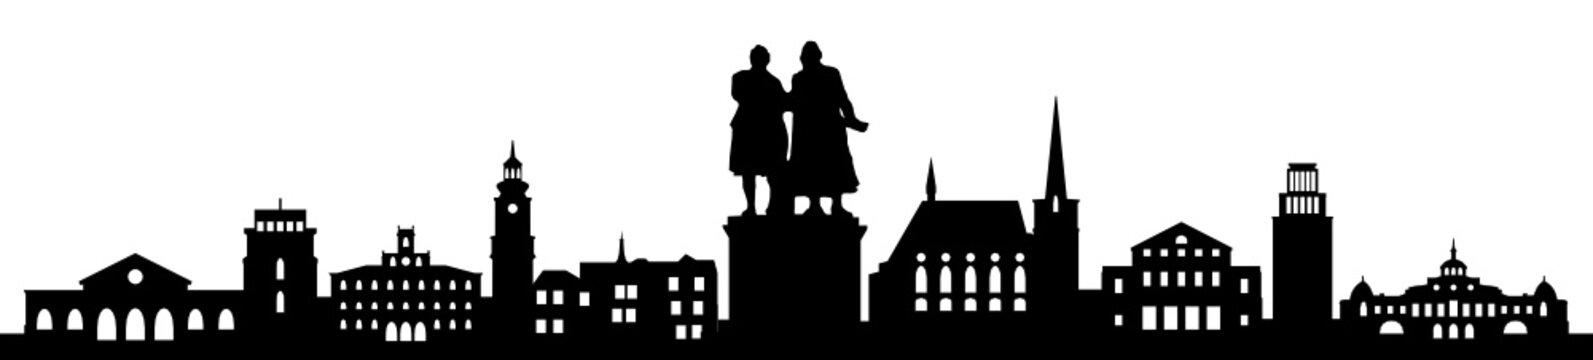 Skyline Weimar